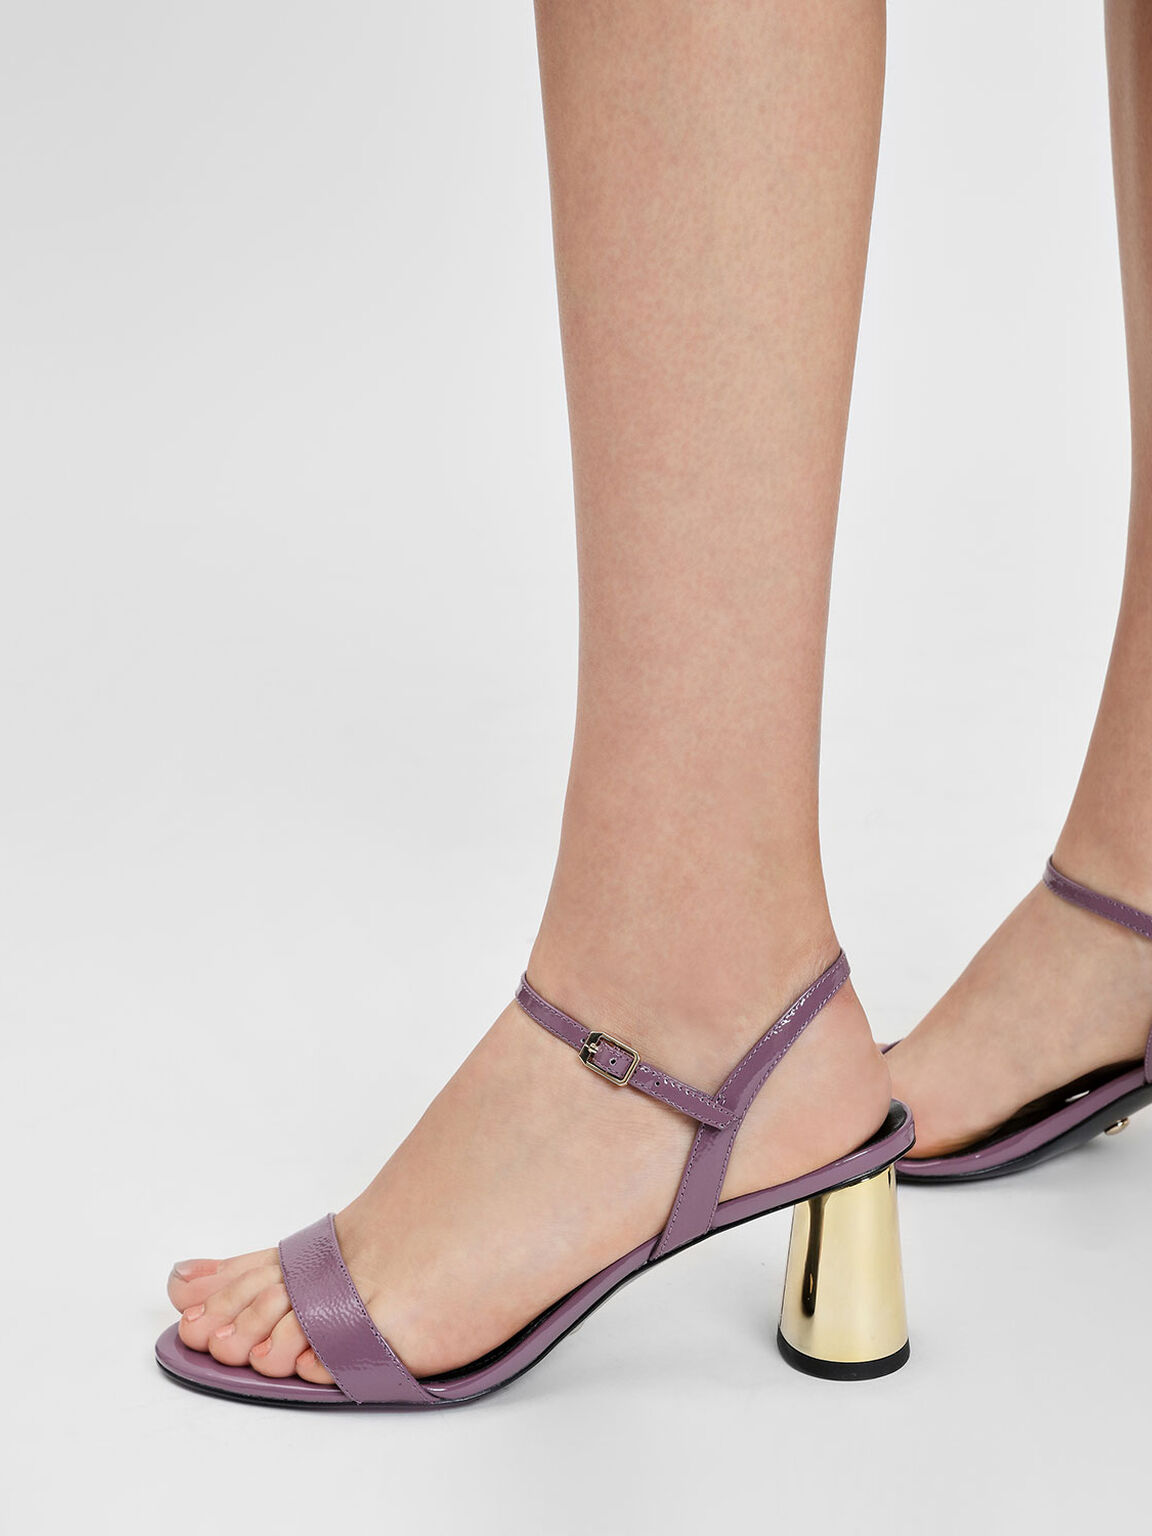 Chrome Heel Leather Sandals, Mauve, hi-res